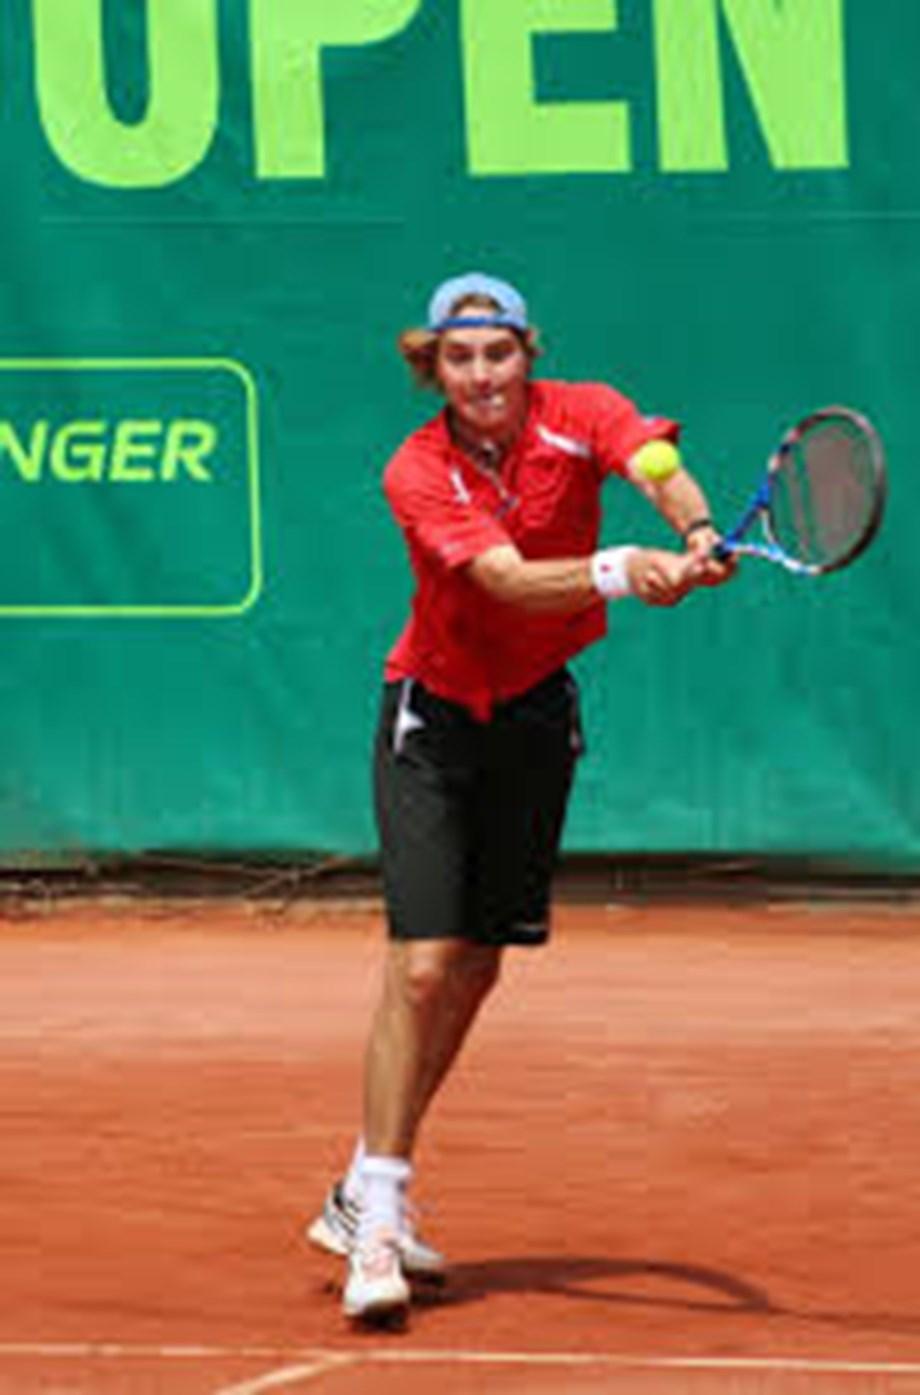 Tennis-Unseeded Struff knocks out Tsitsipas in Cincinnati